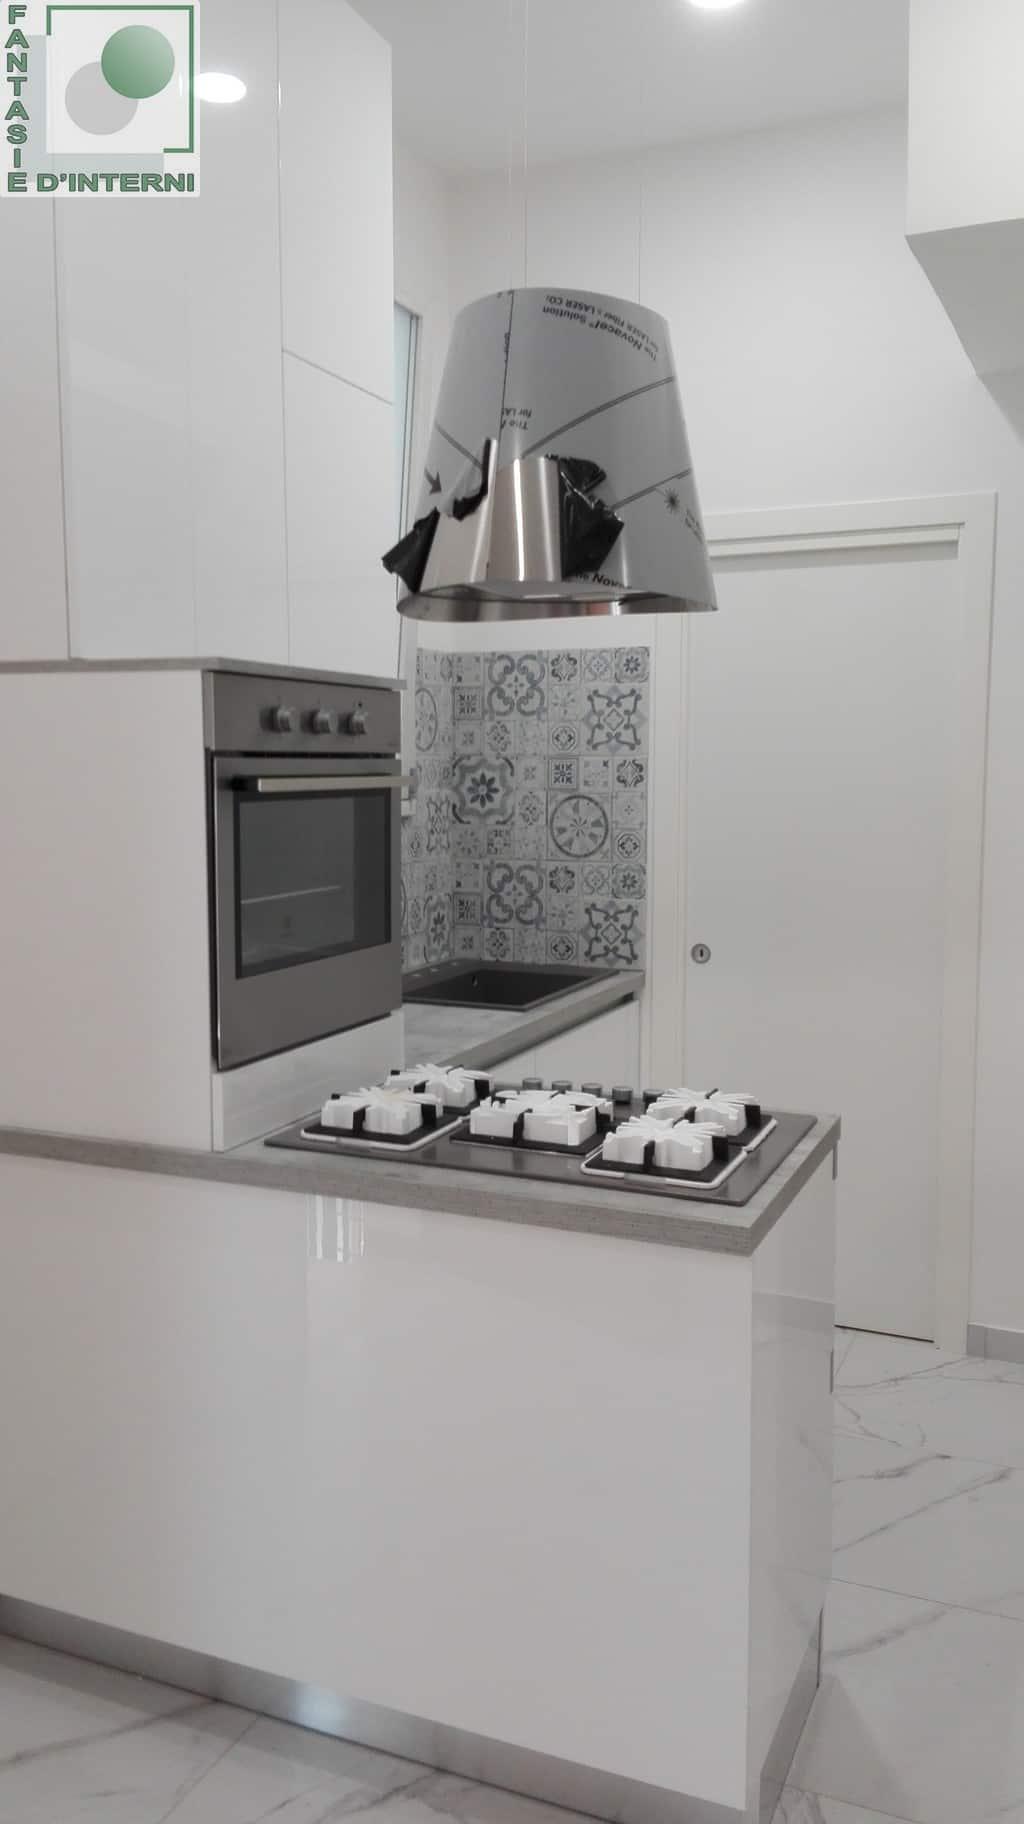 Cucine componibili   Fantasie di Interni Trapani   Cucine ...